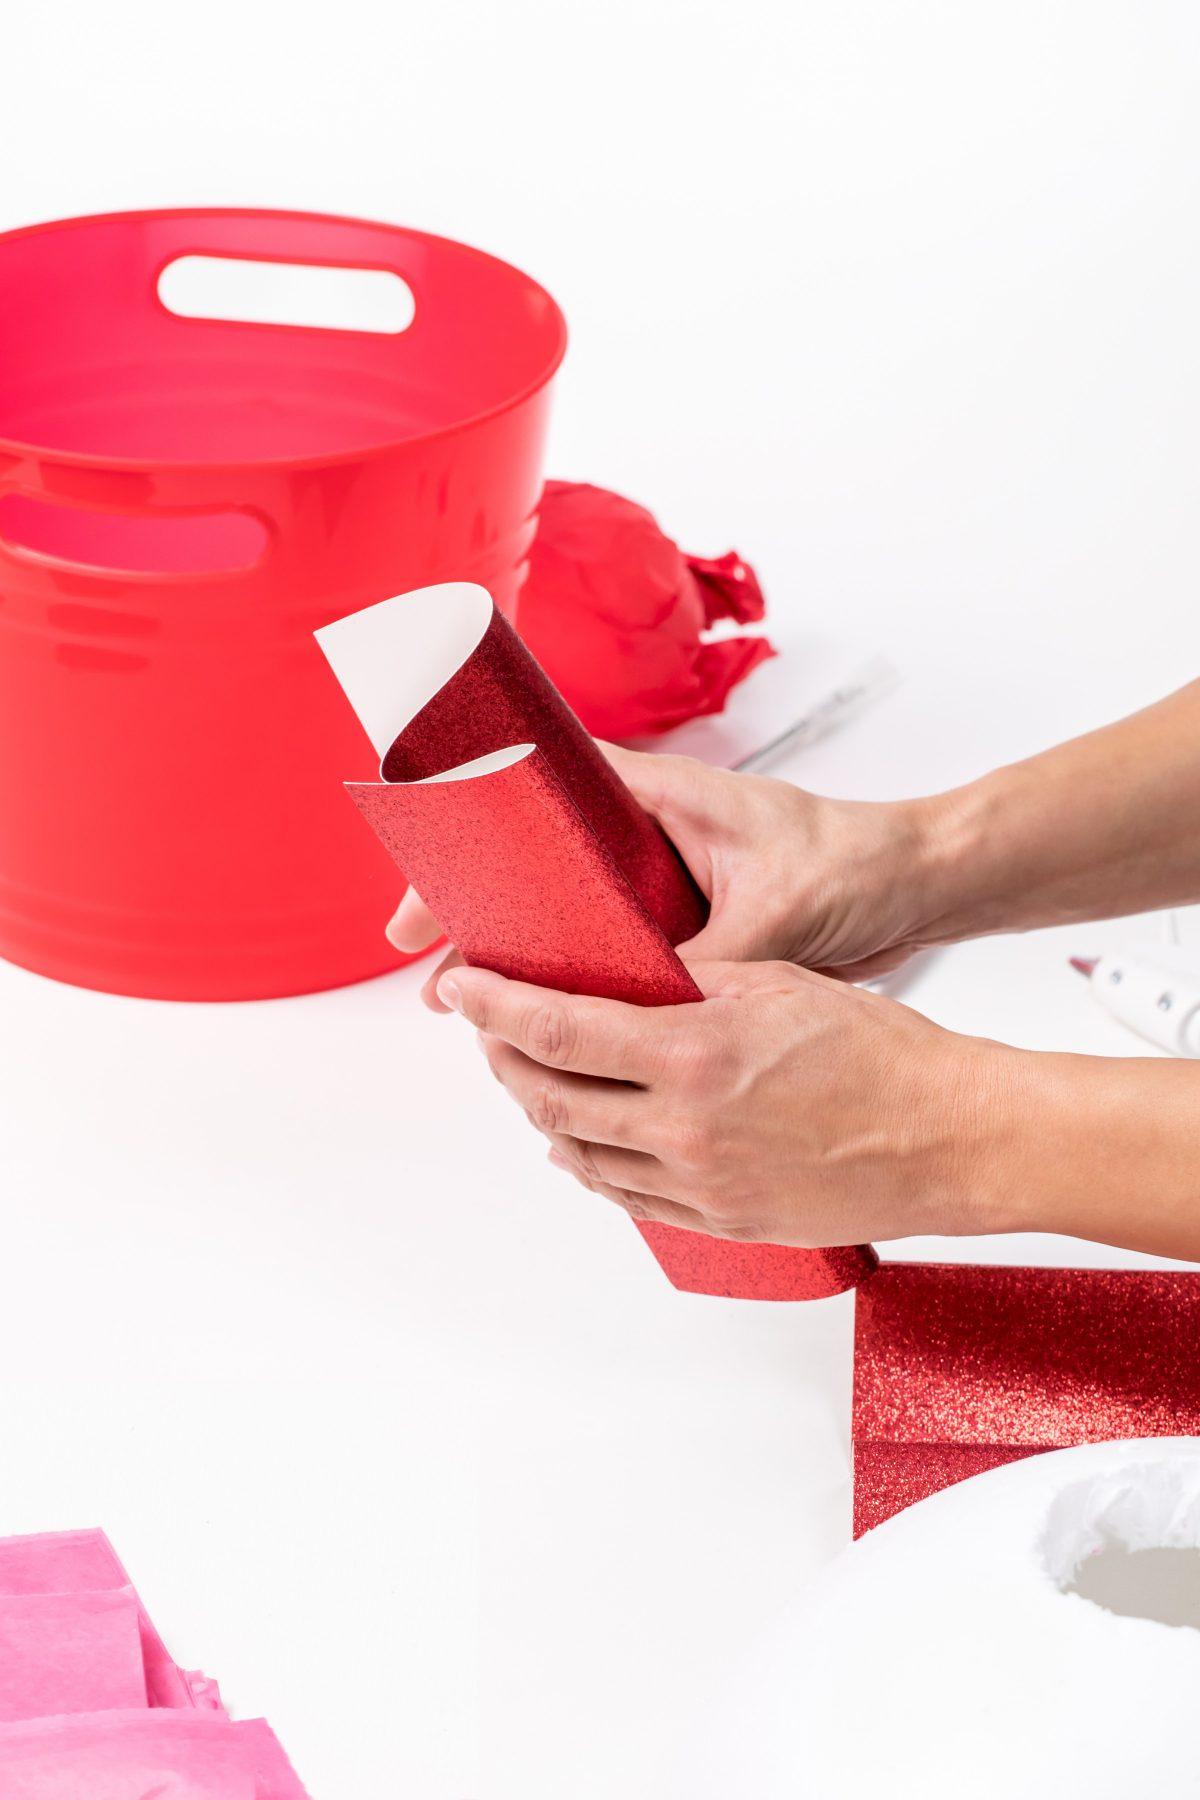 5D4B8130 - Cupcake Valentine Day Box - Fold paper